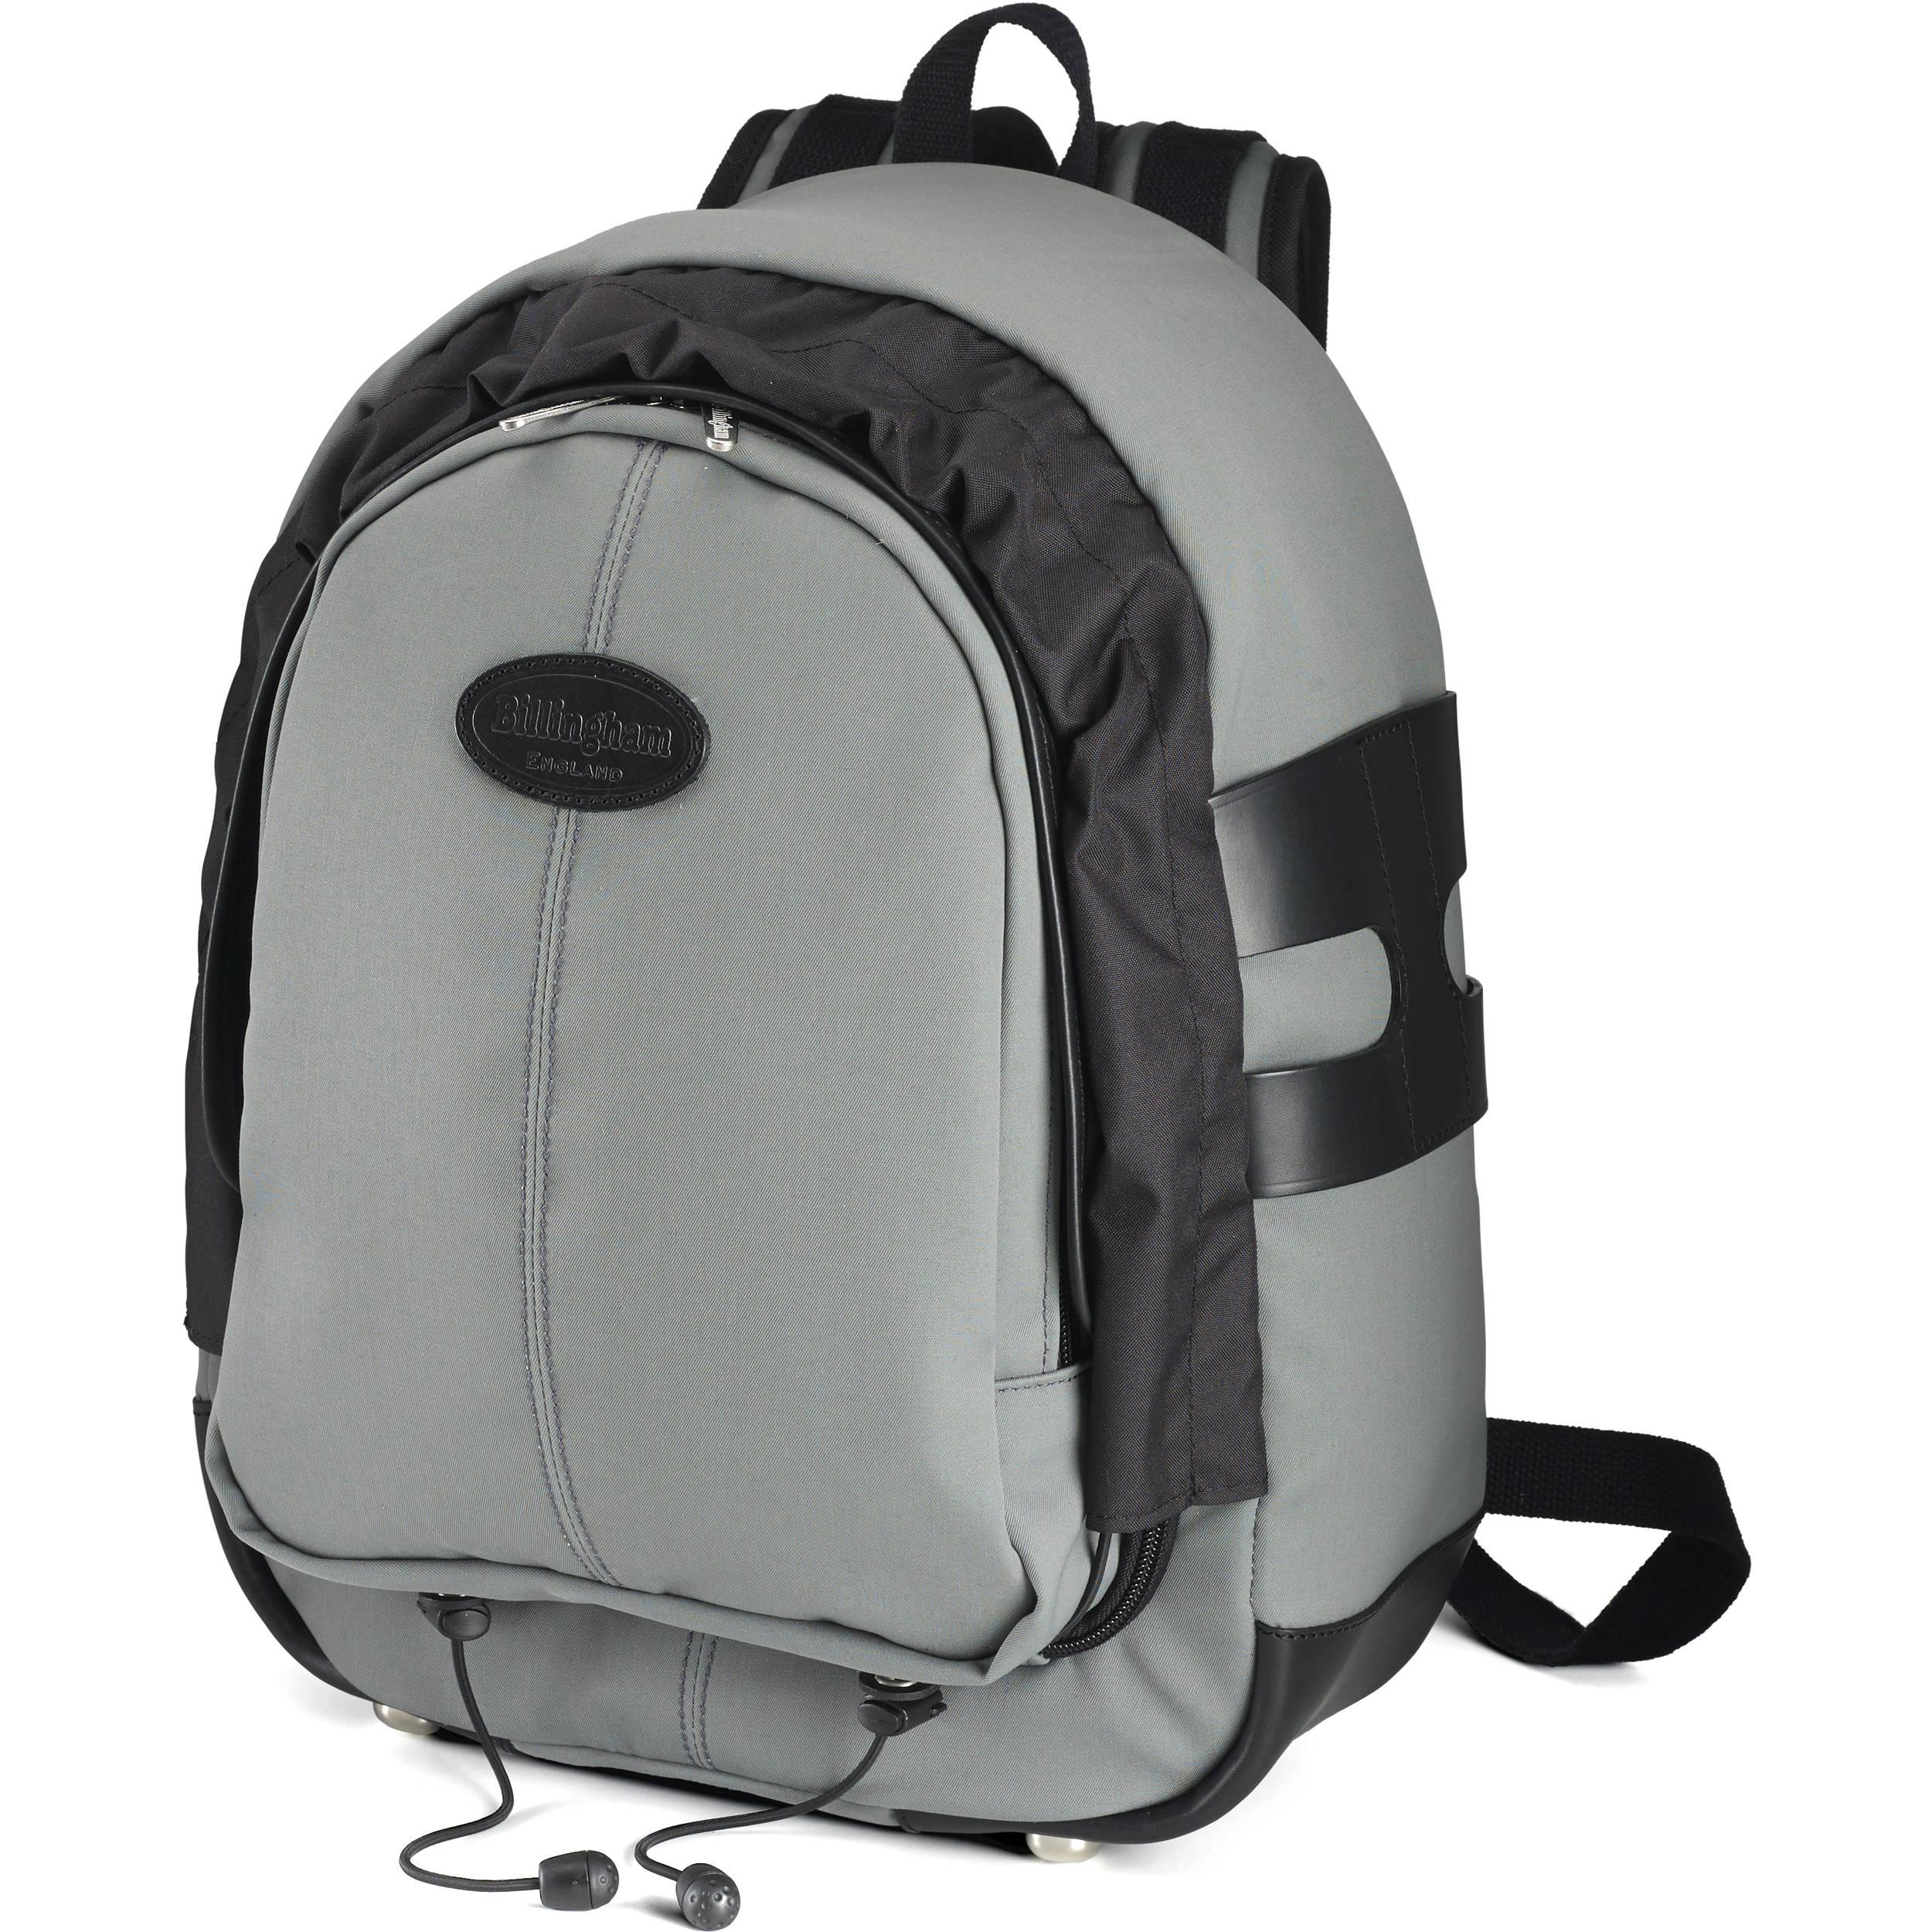 4cef966e8db5d0 Billingham Rucksack 25 (Gray Canvas/Black Leather) 502525-01 B&H